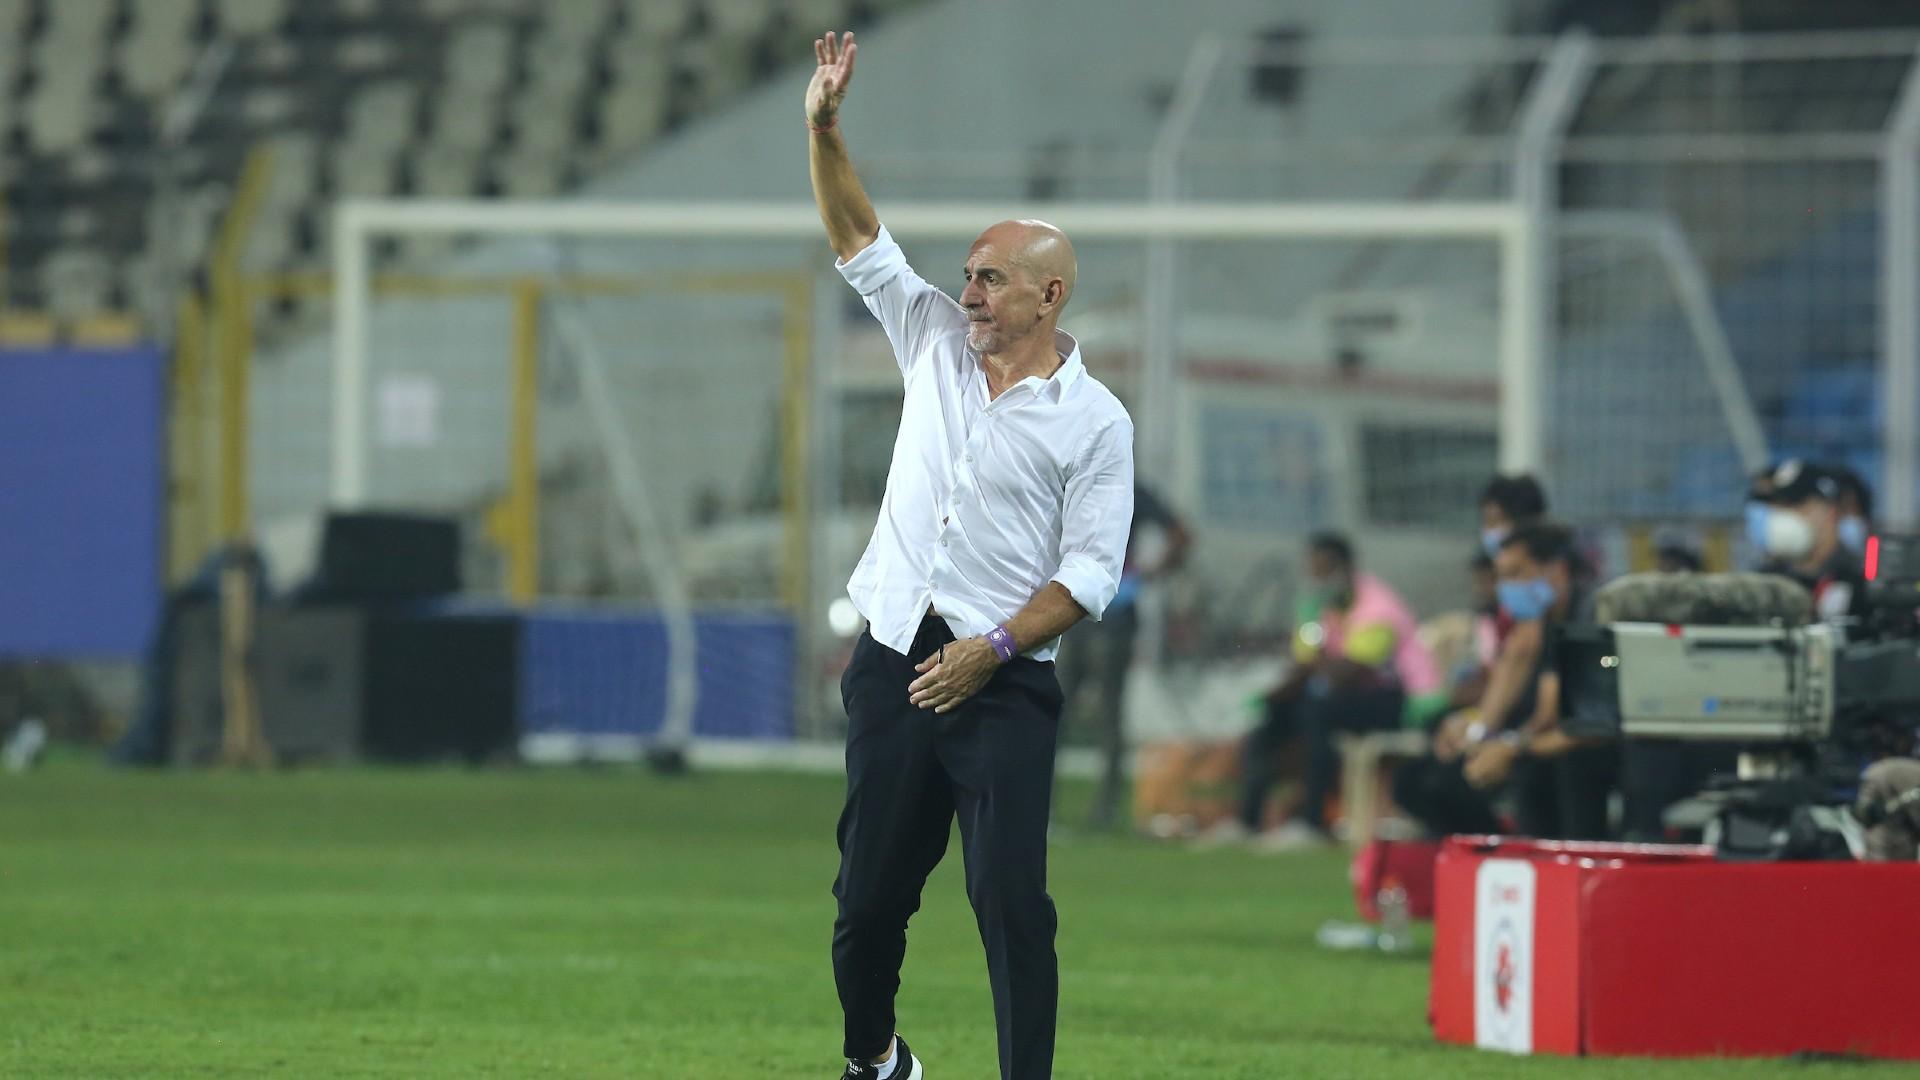 'Unfair footbal!' - Antonio Habas unhappy with Mumbai City's goal following defeat